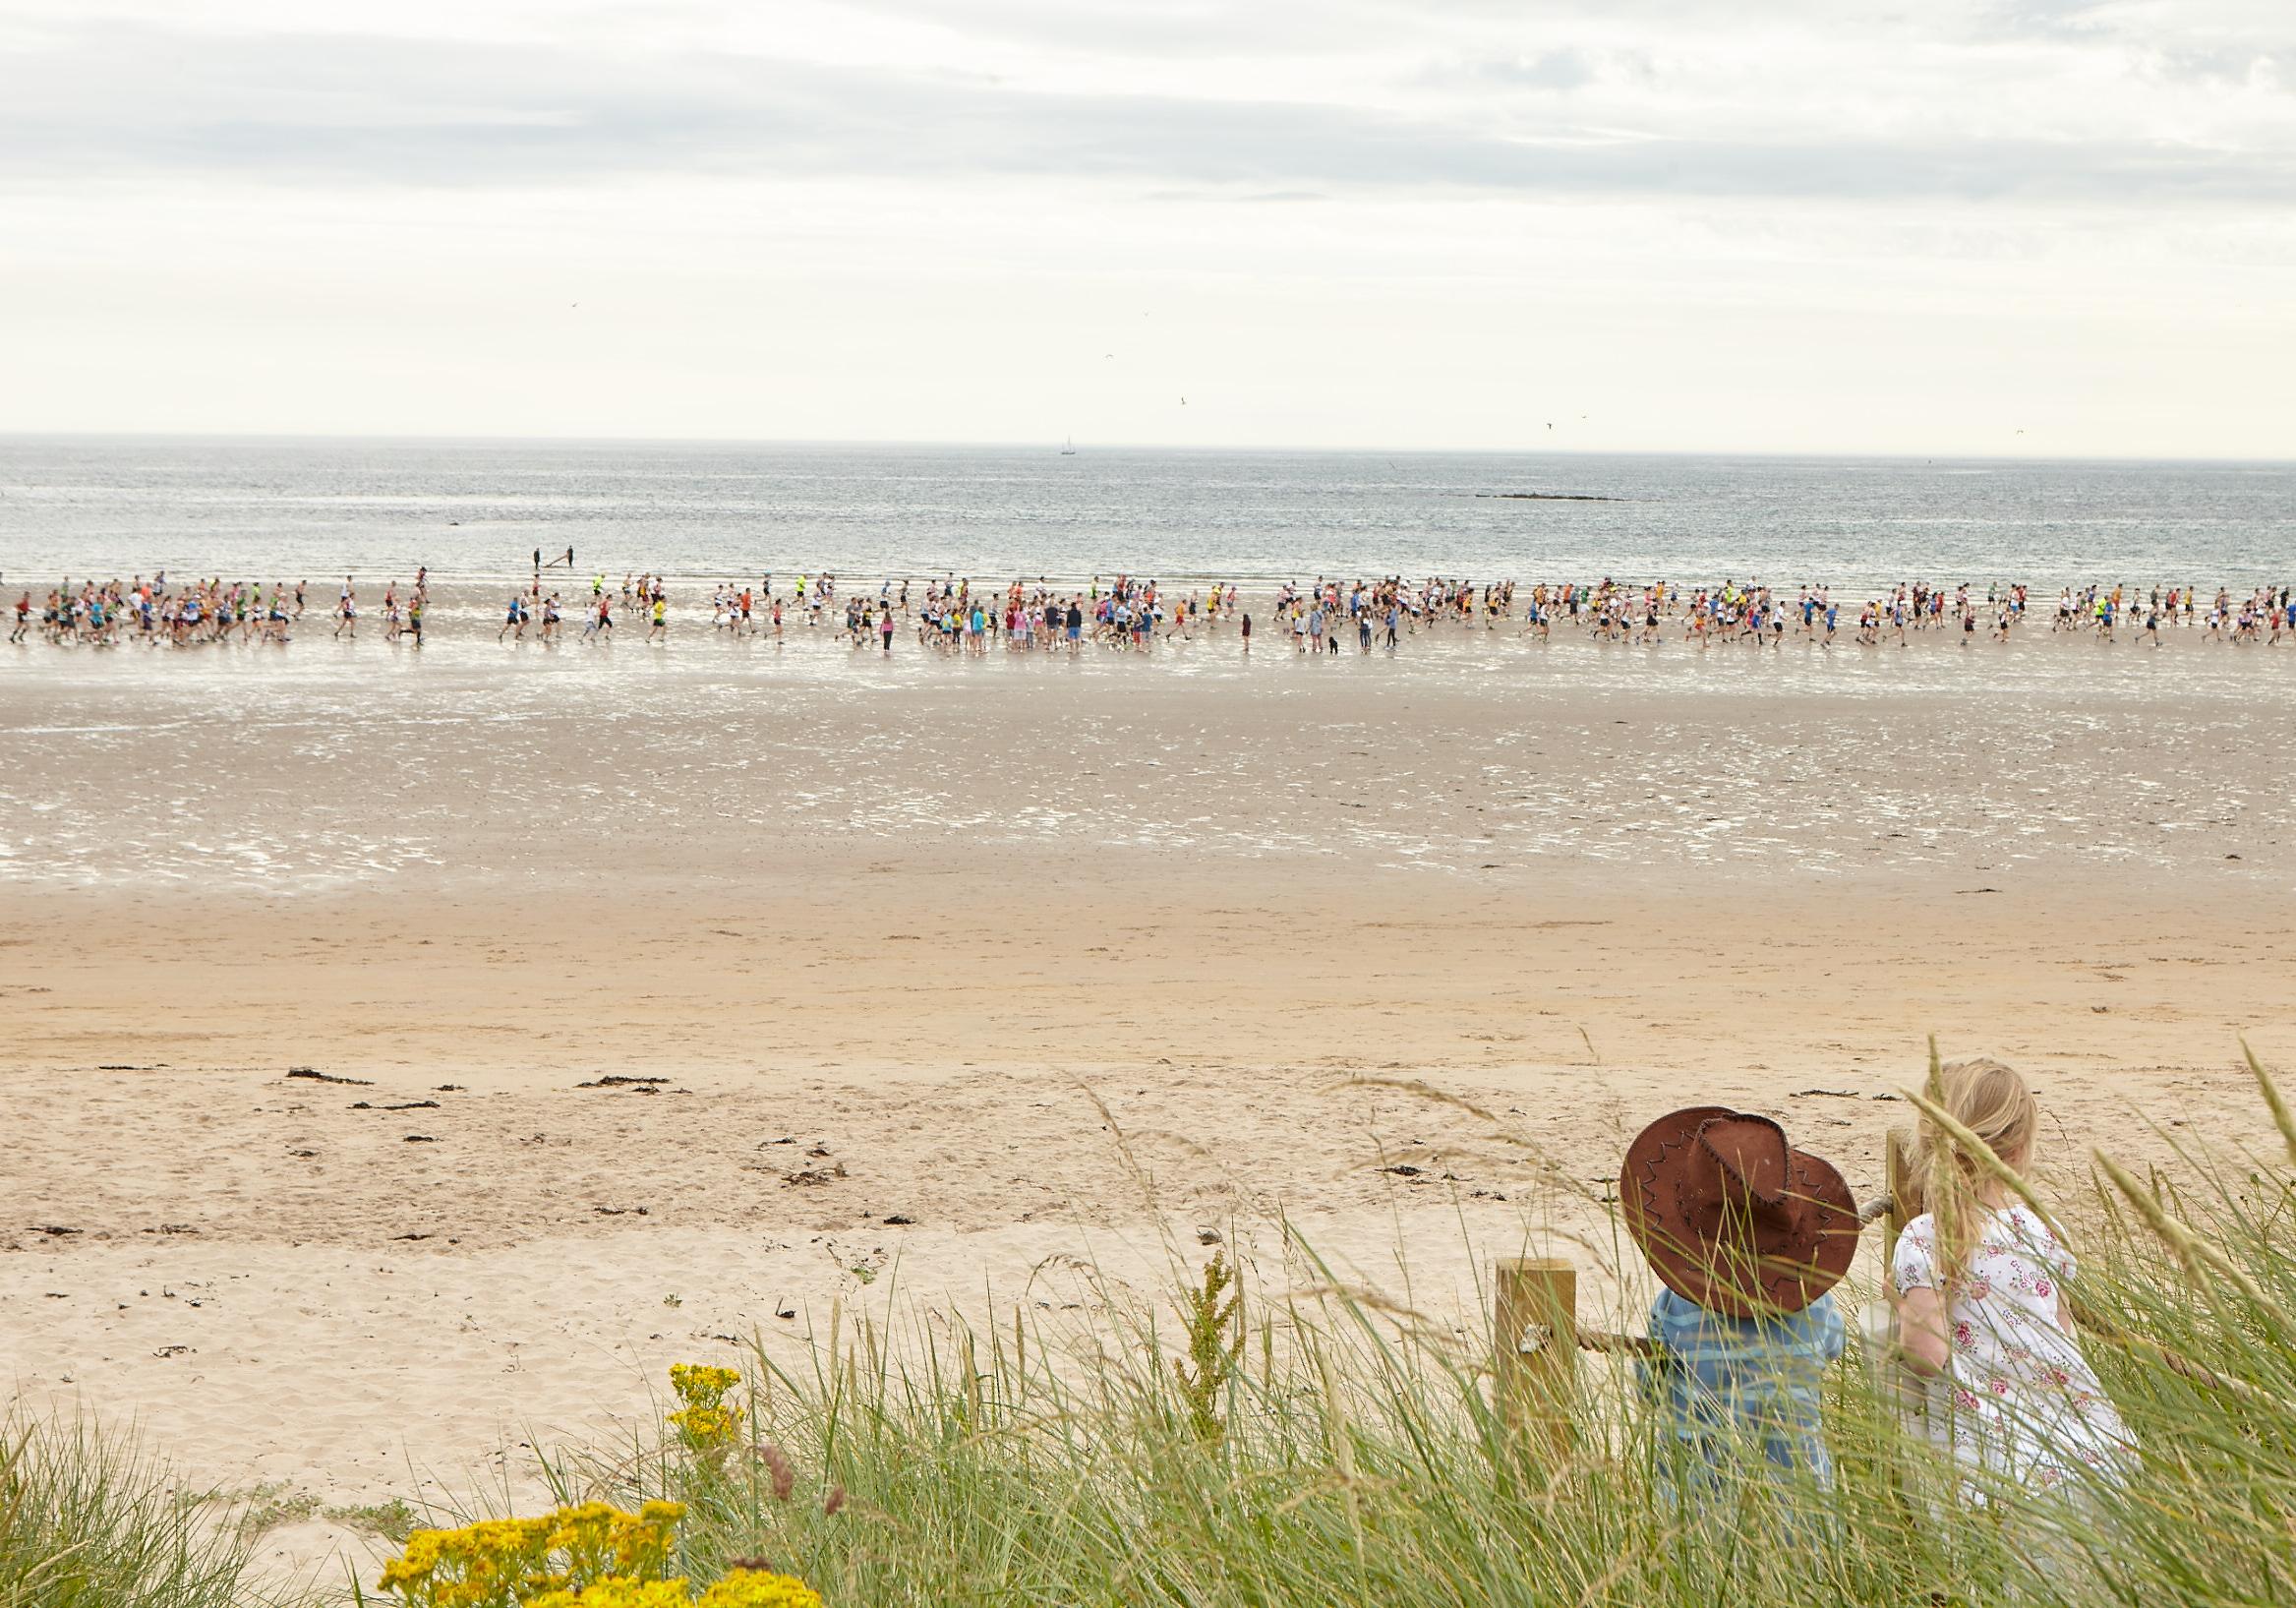 Witness one of many beach runs